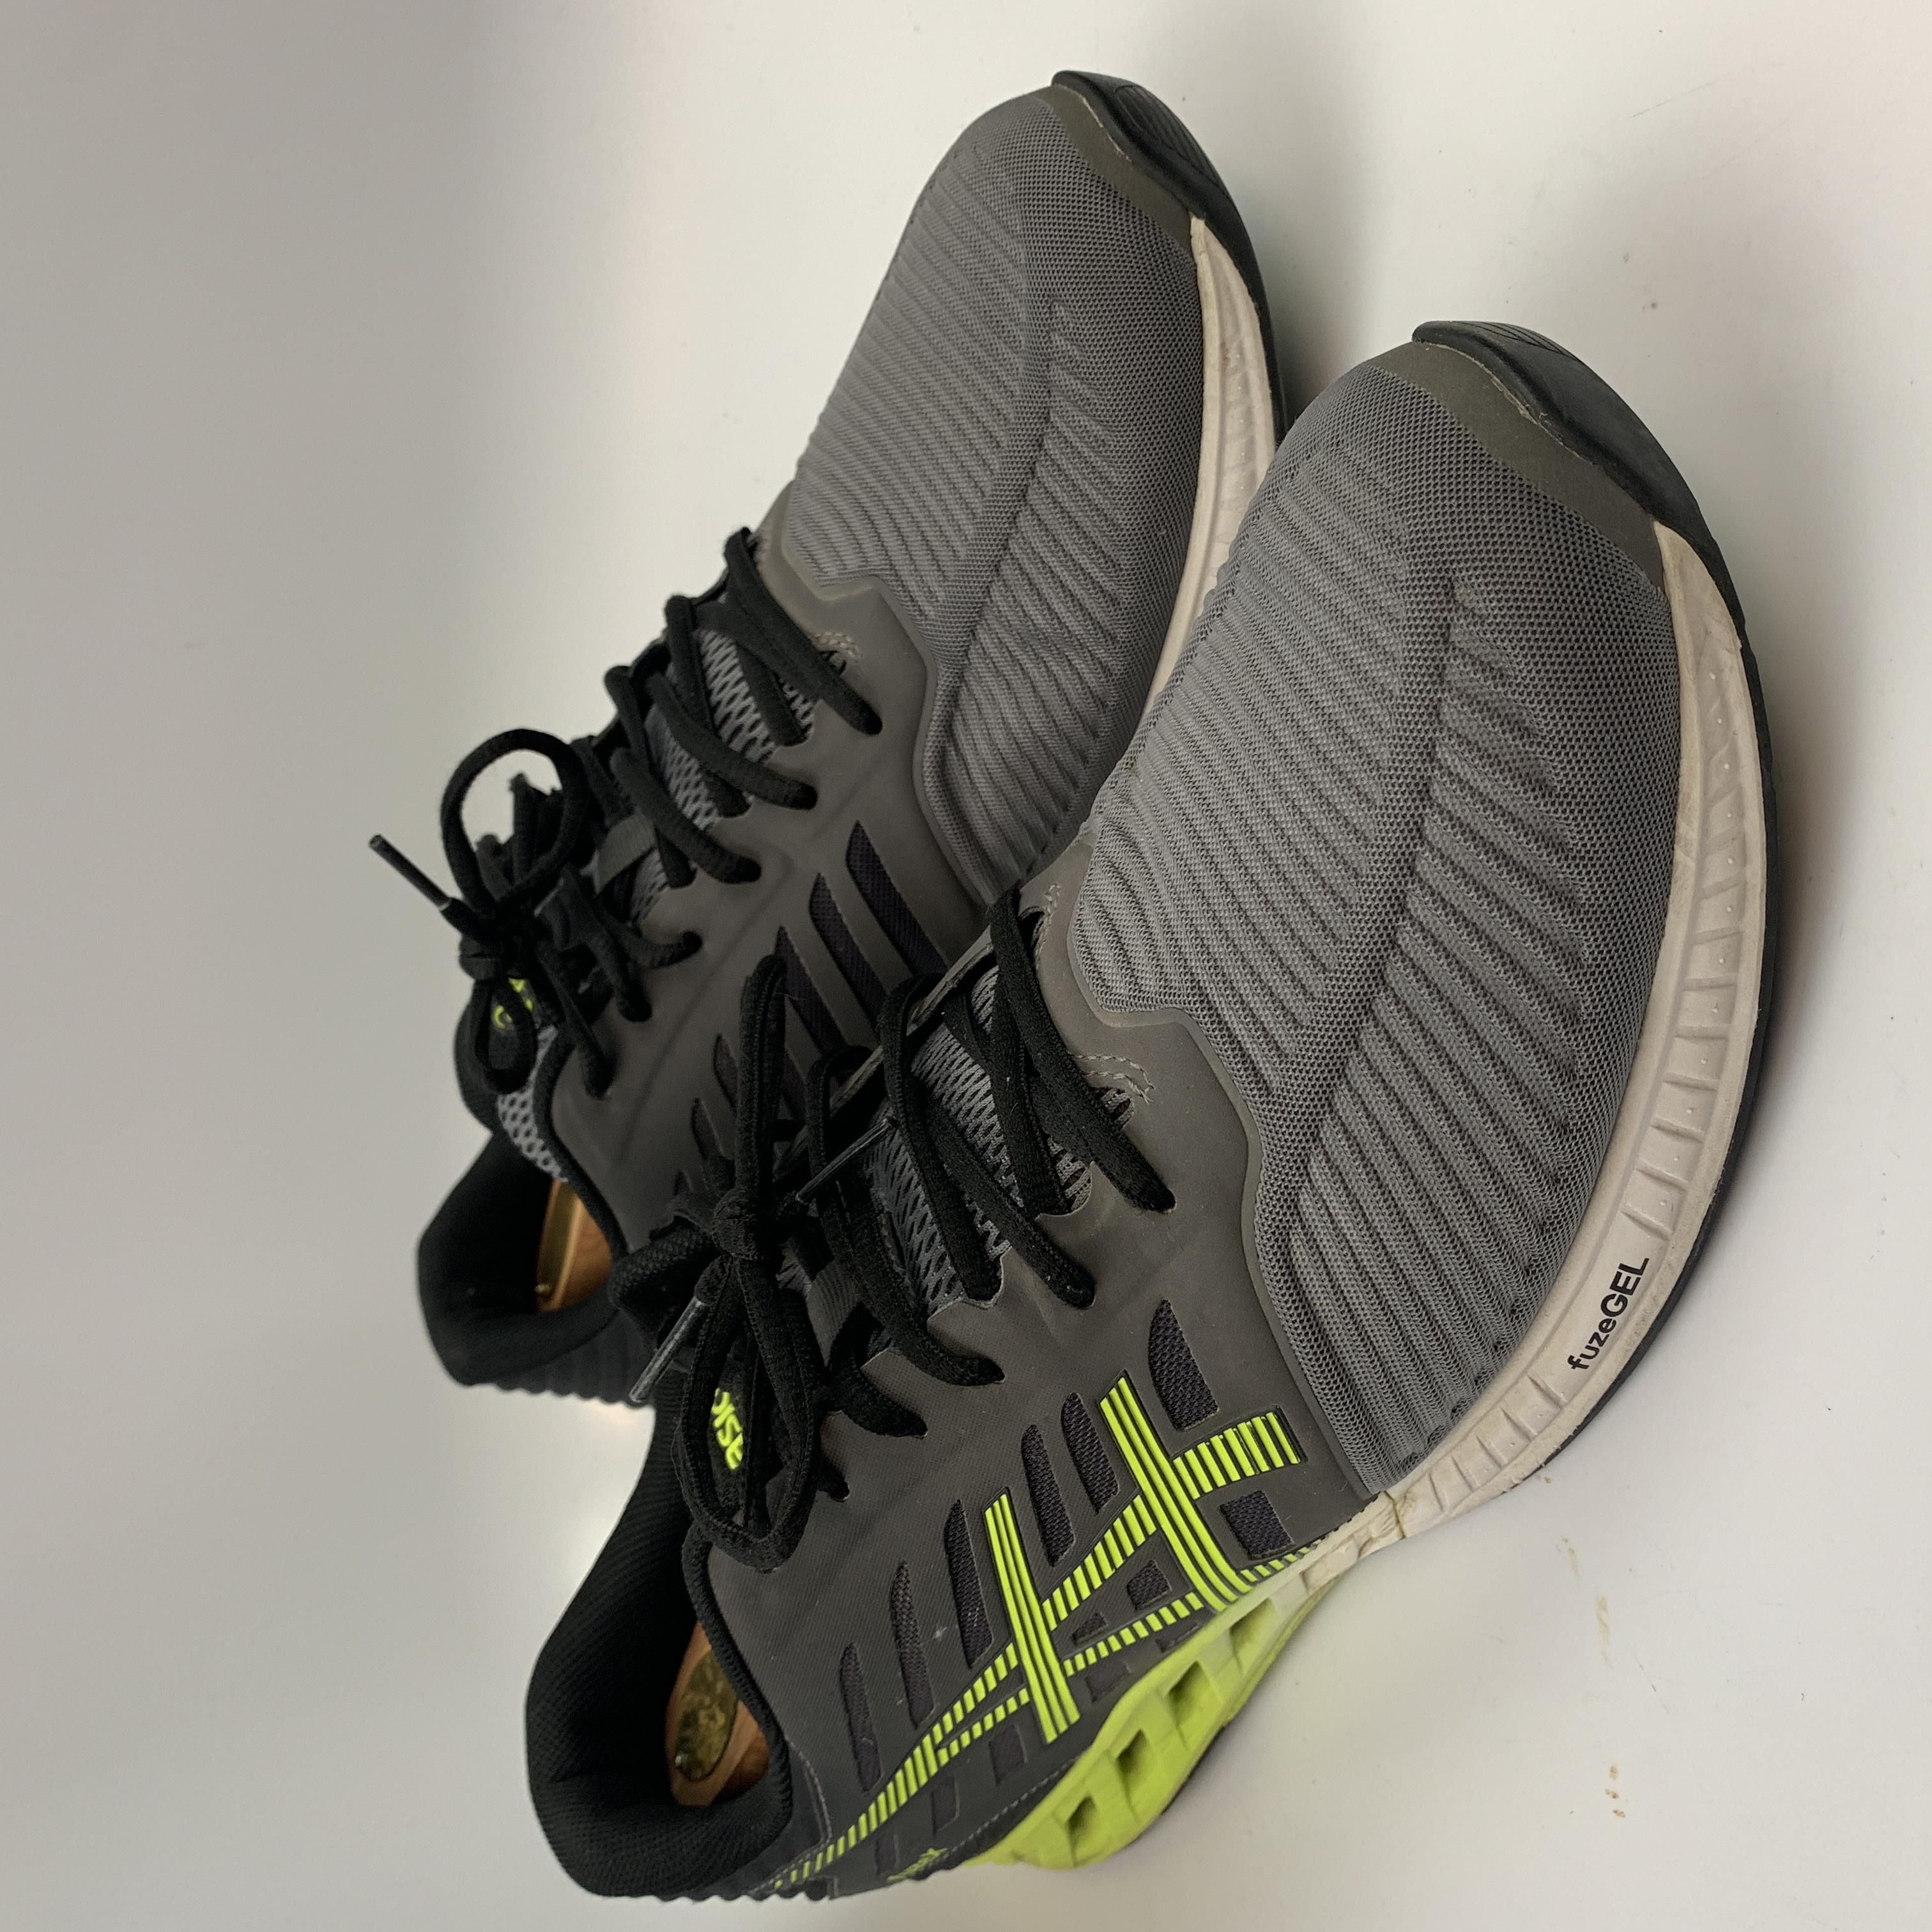 talla 40 precio oficial talla 40 Asics Asics 14 Us / 49 Eu Men Athletic Running Shoes Gray Neon Gr | Grailed